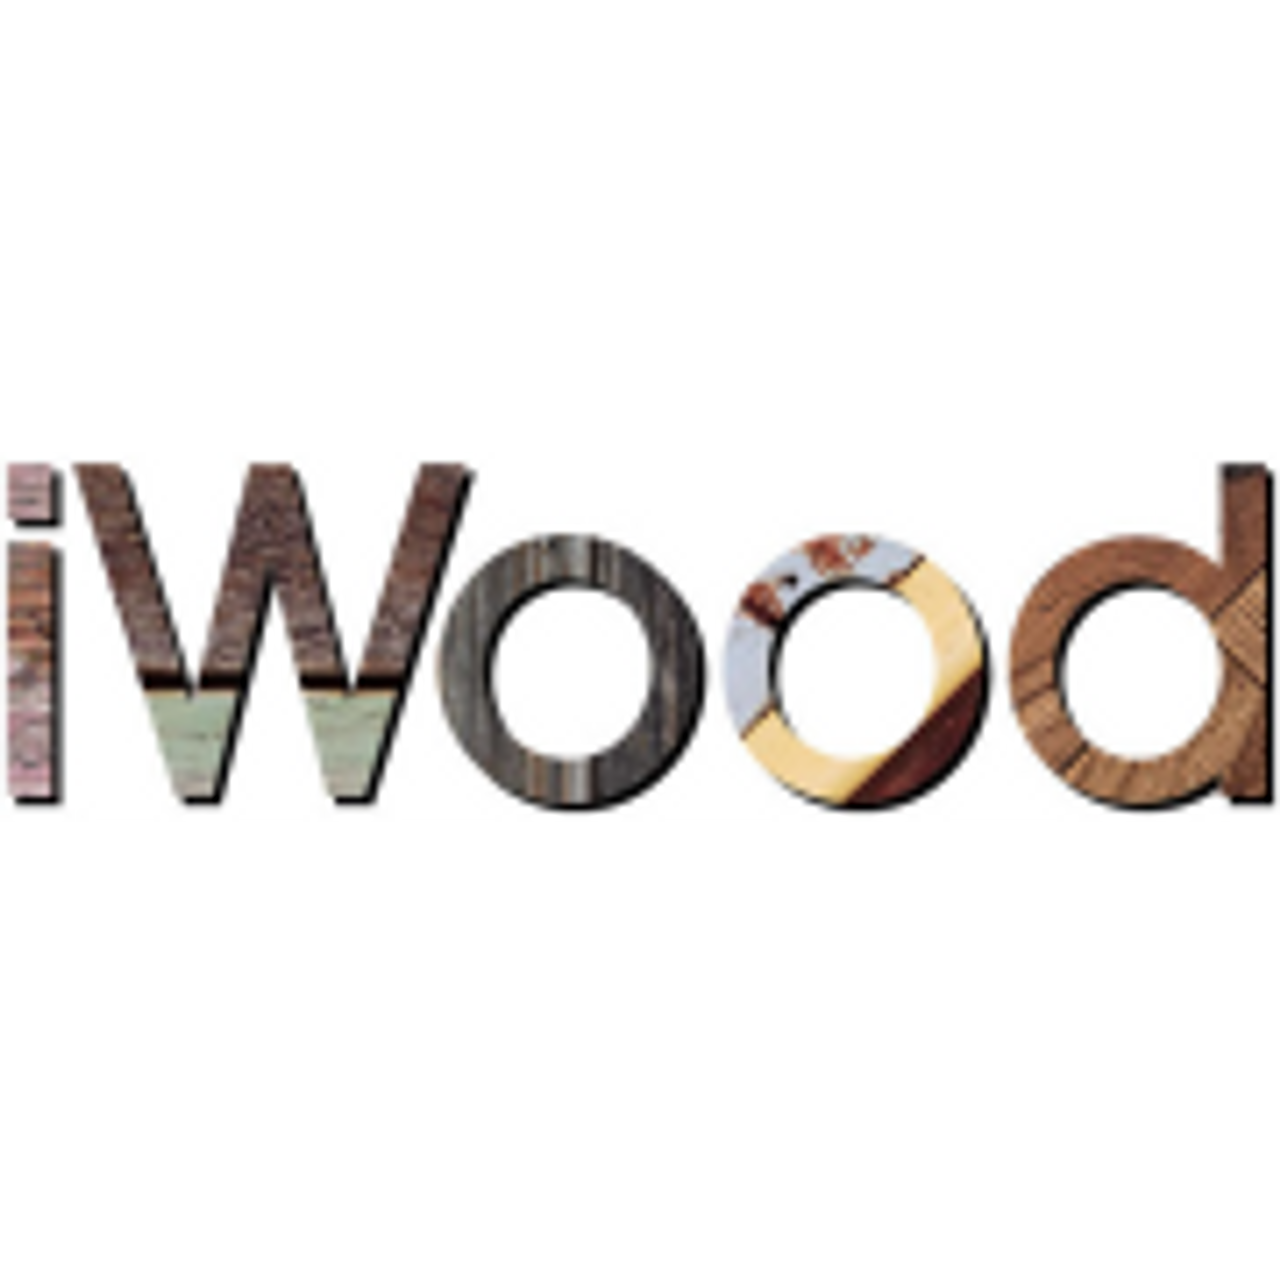 iwood